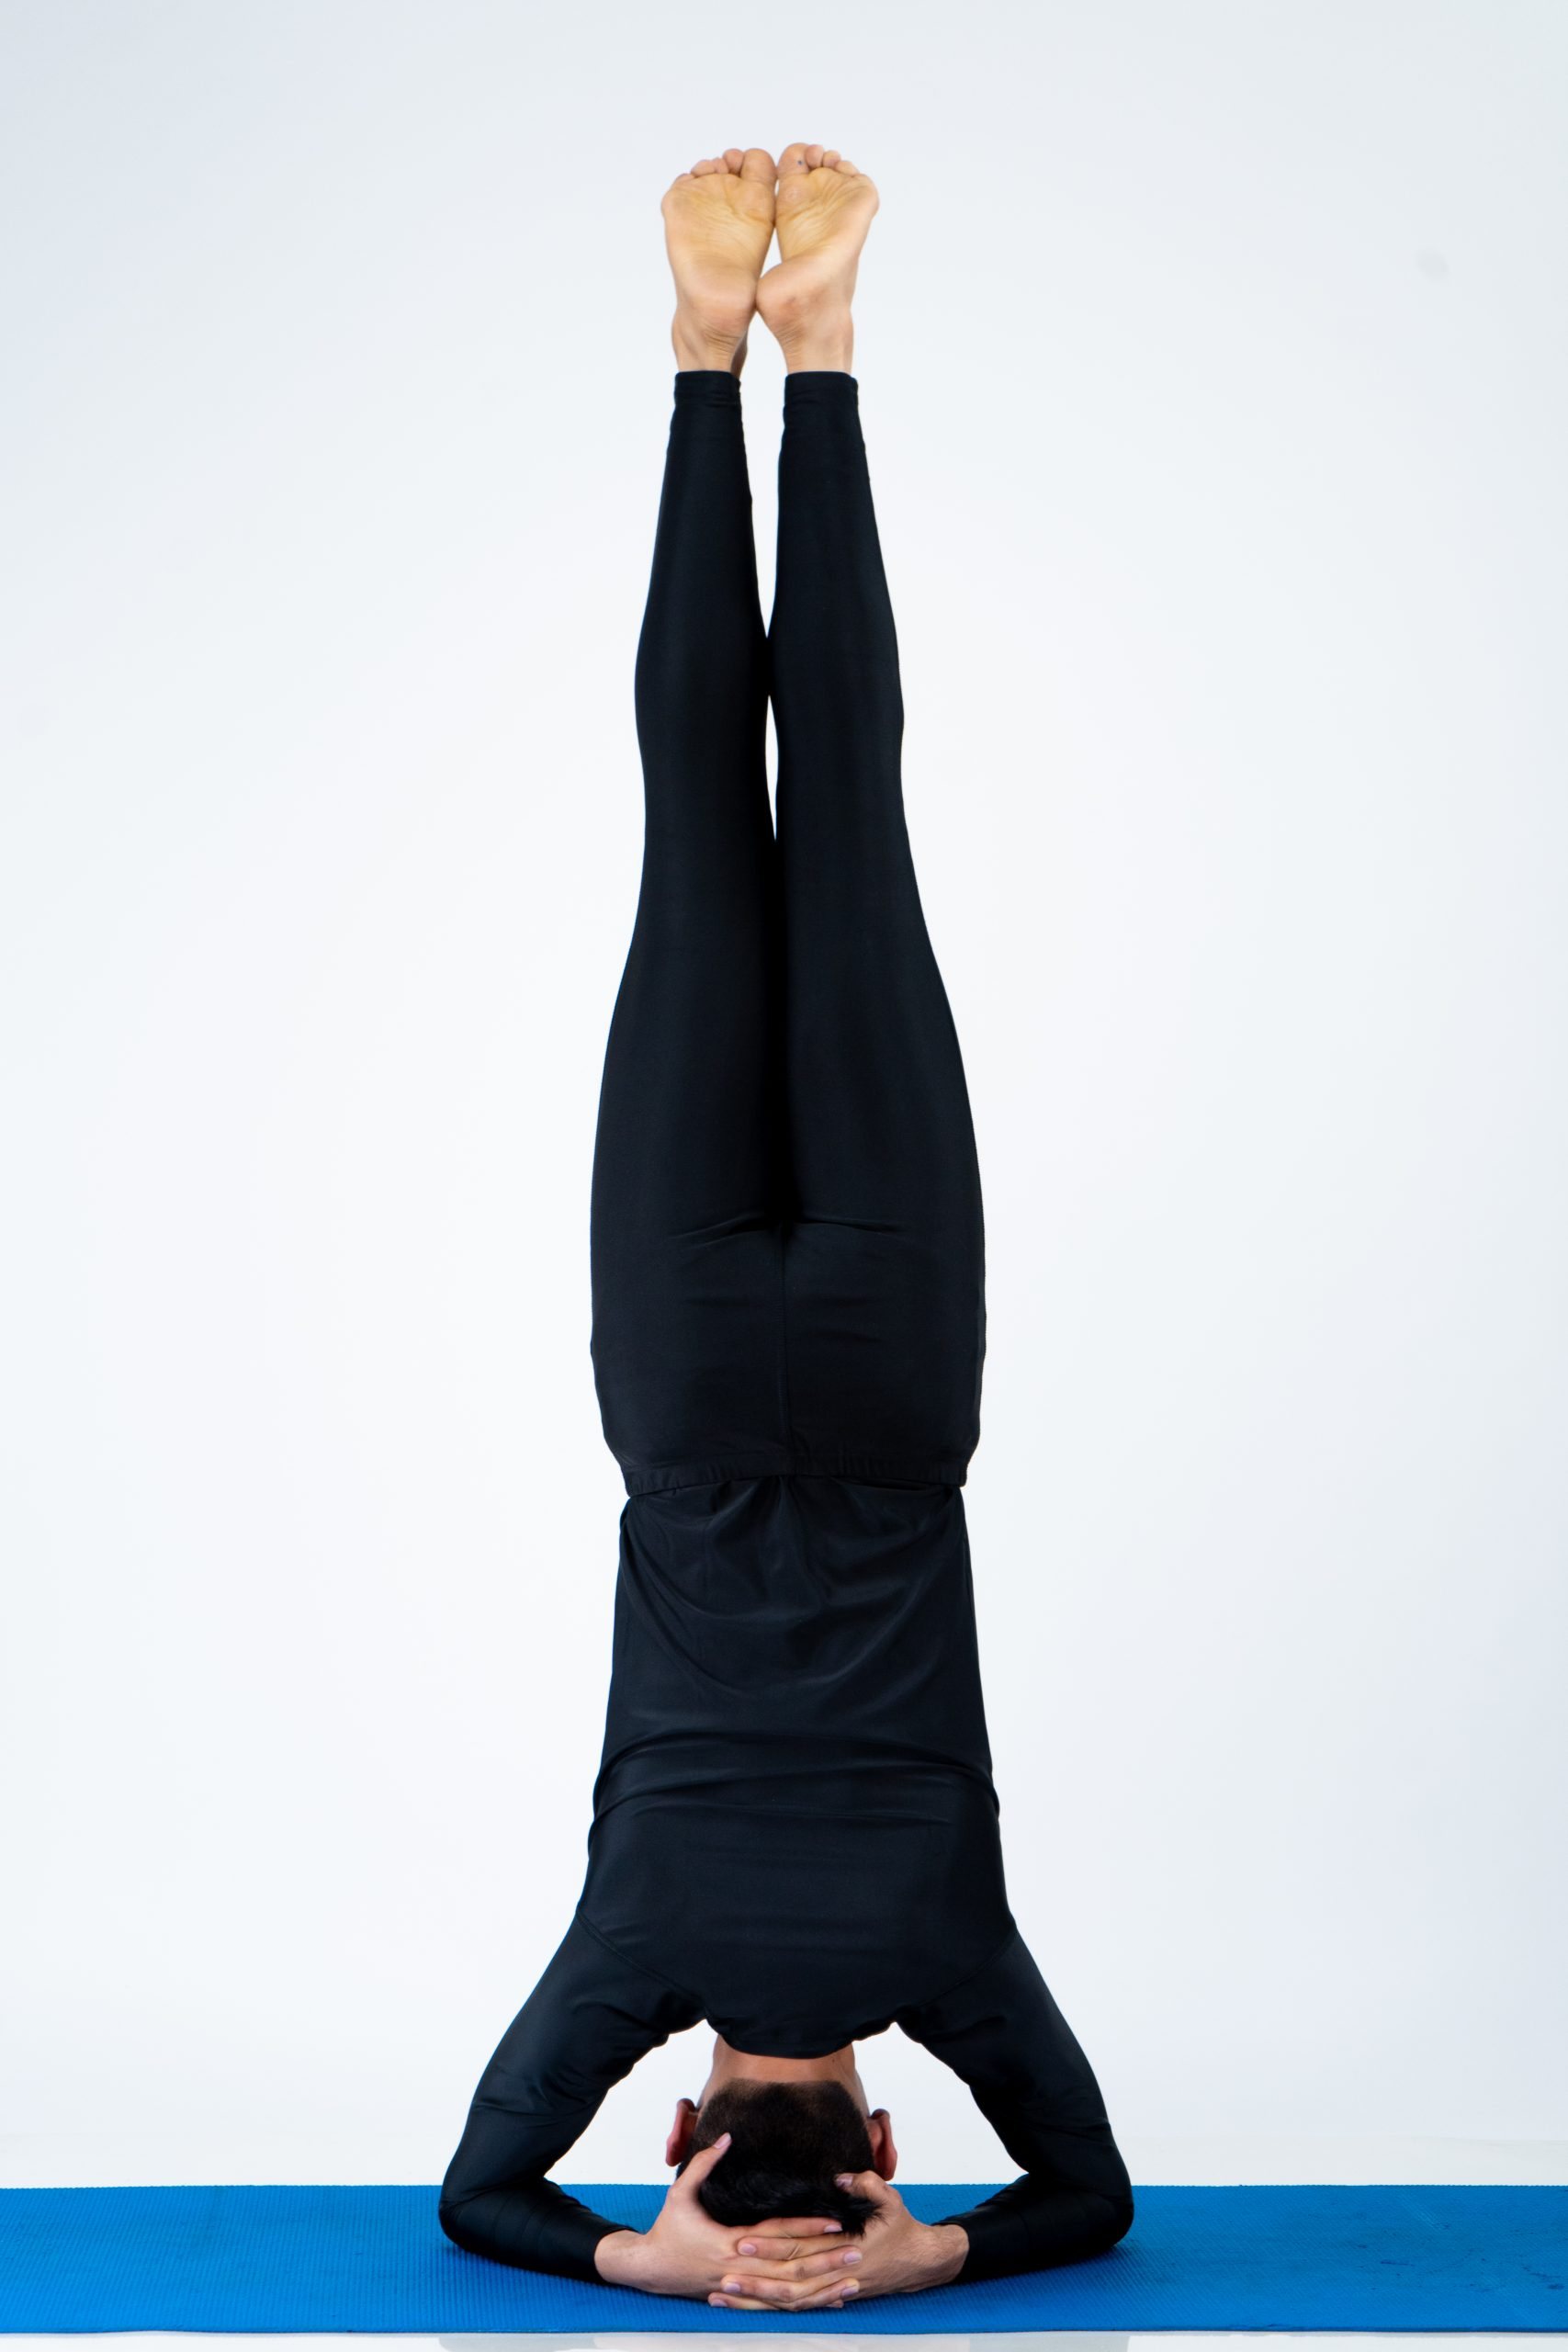 Sirsasana (Headstand)